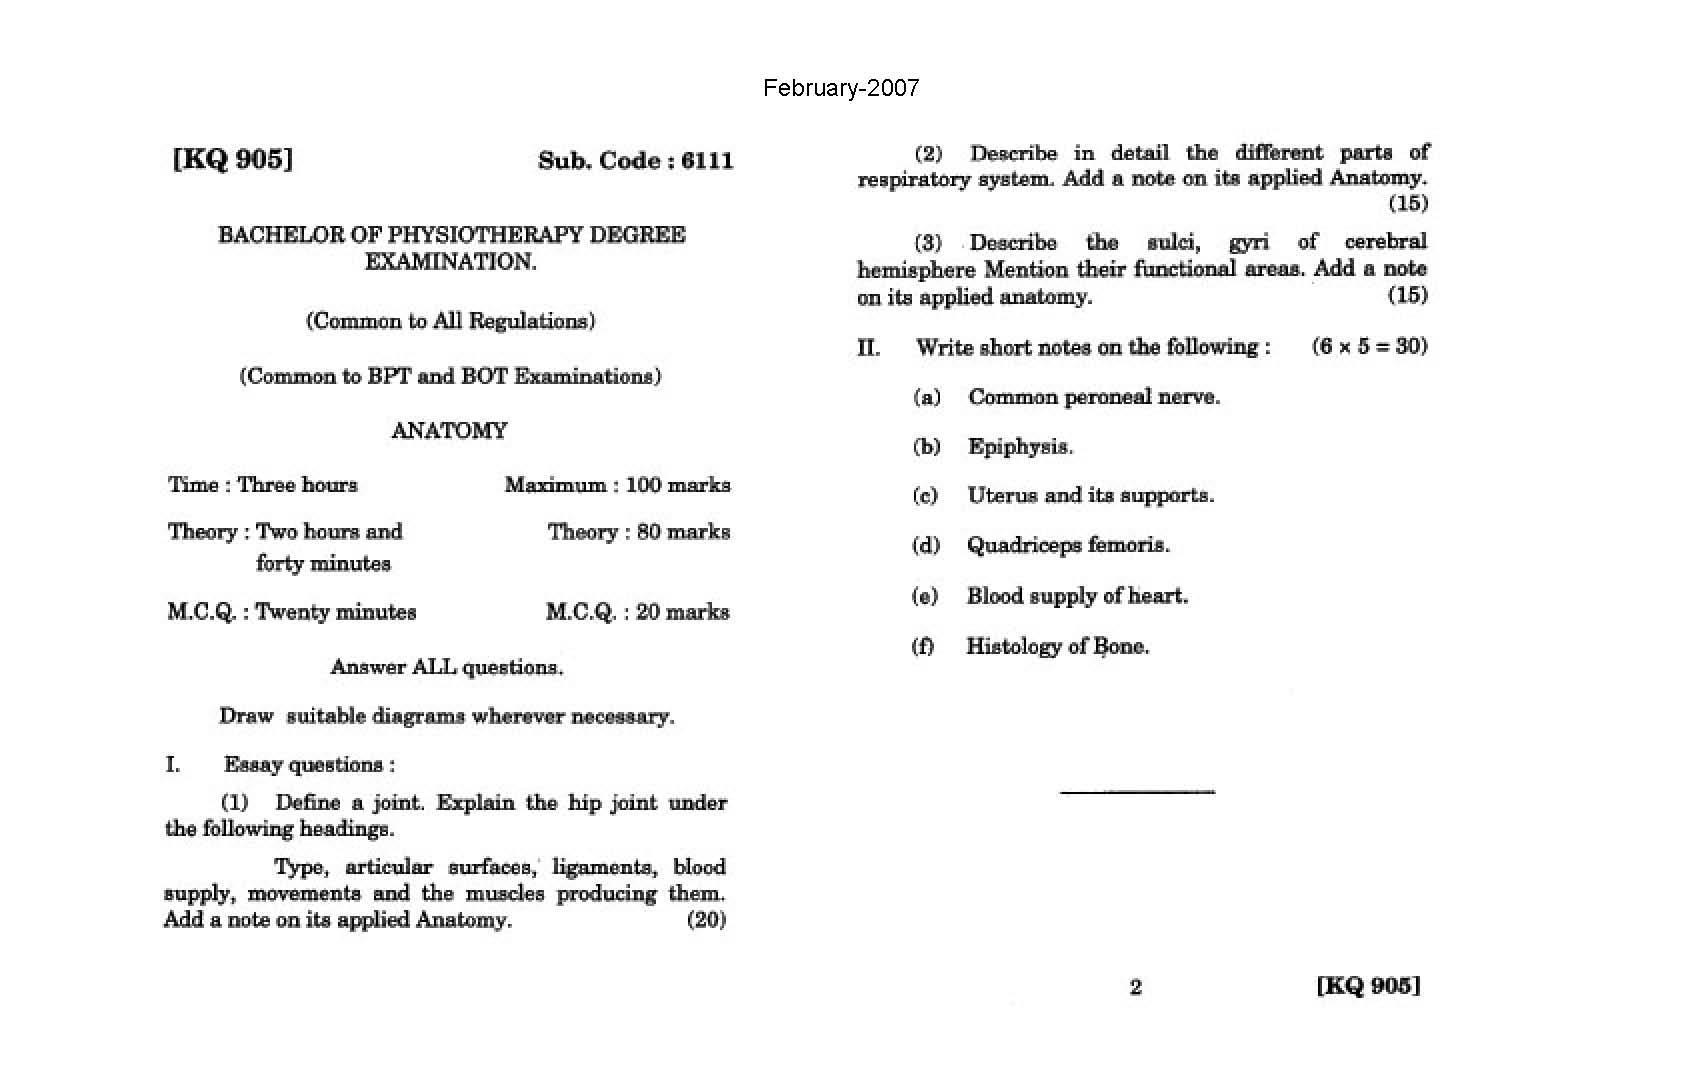 The Tamil Nadu Dr Mgr Medical University General Anatomy Feb 2006